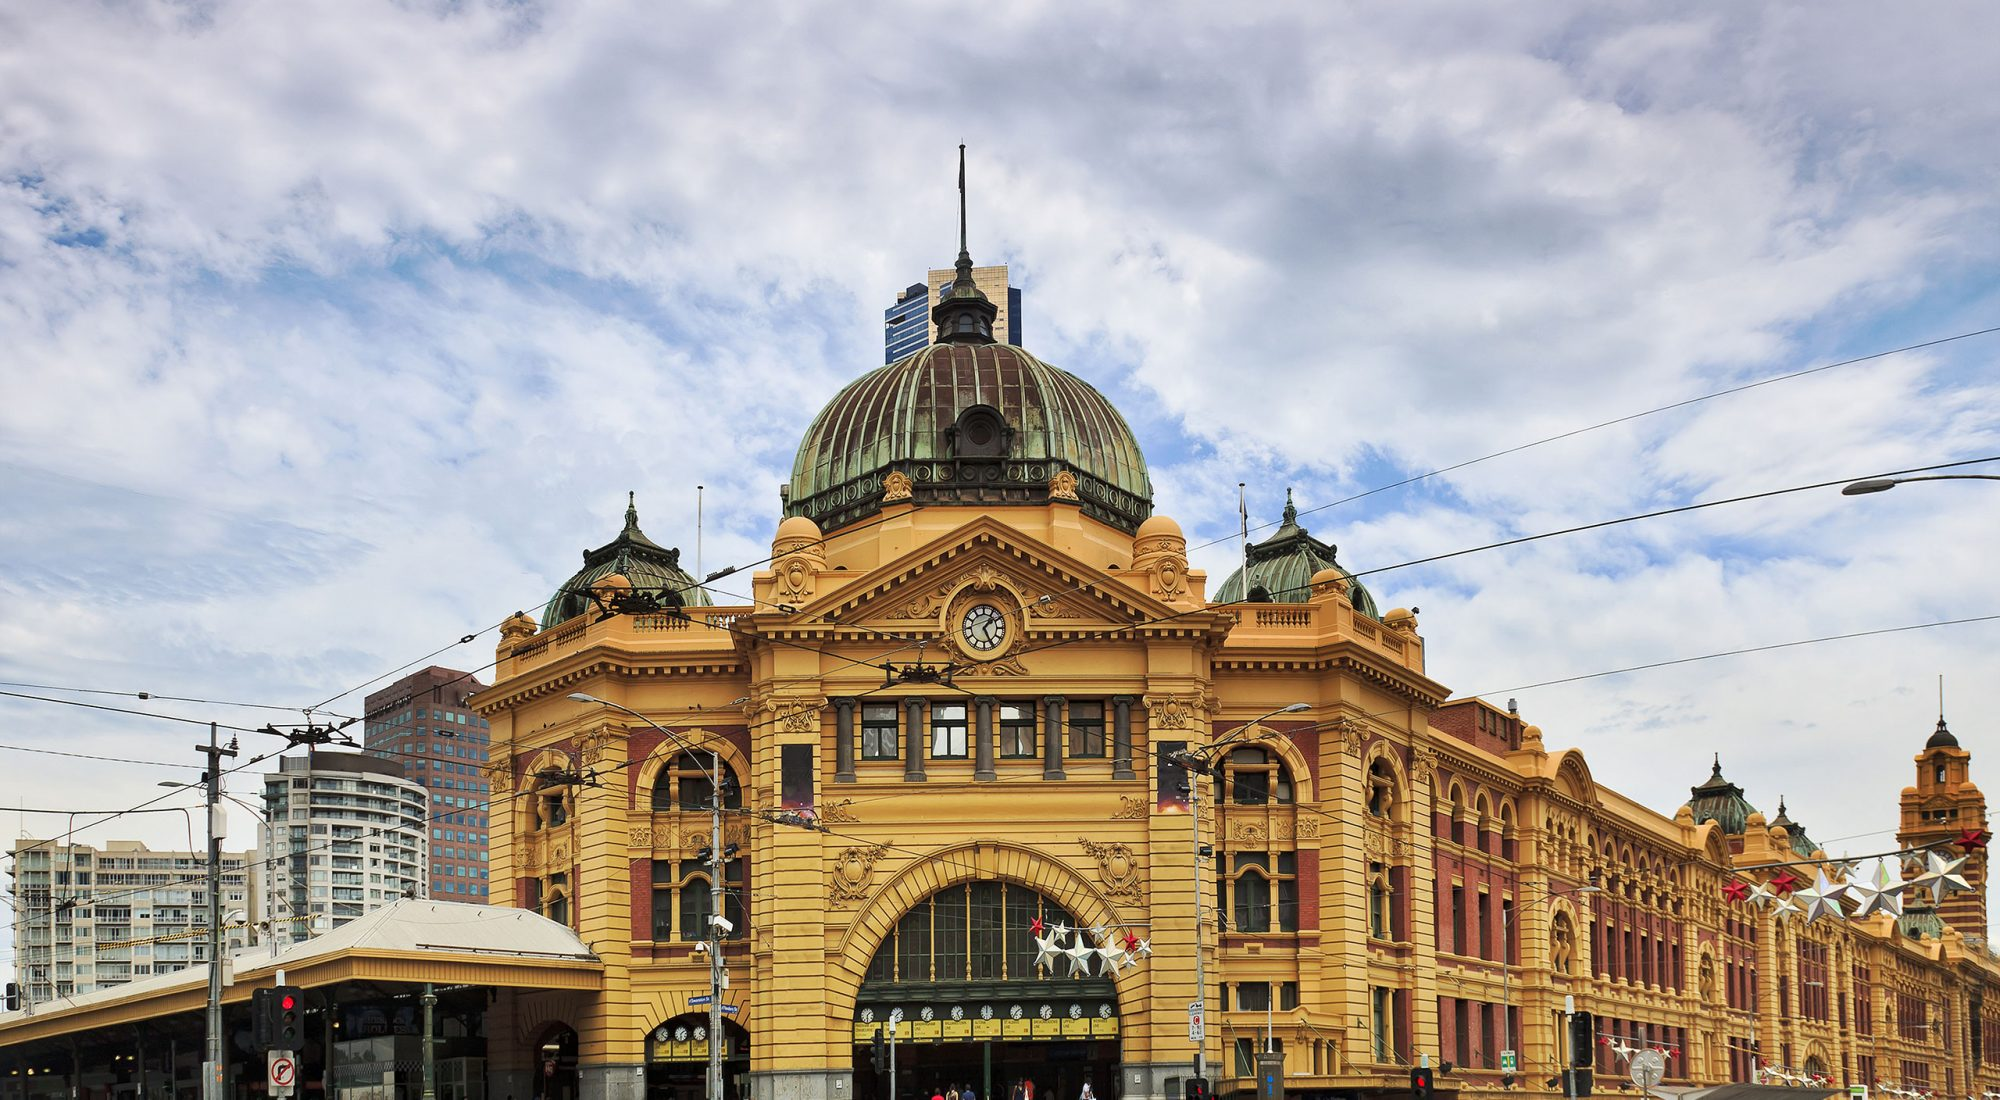 Global Rail Australia Secures Flinders Street Station Upgrade Project